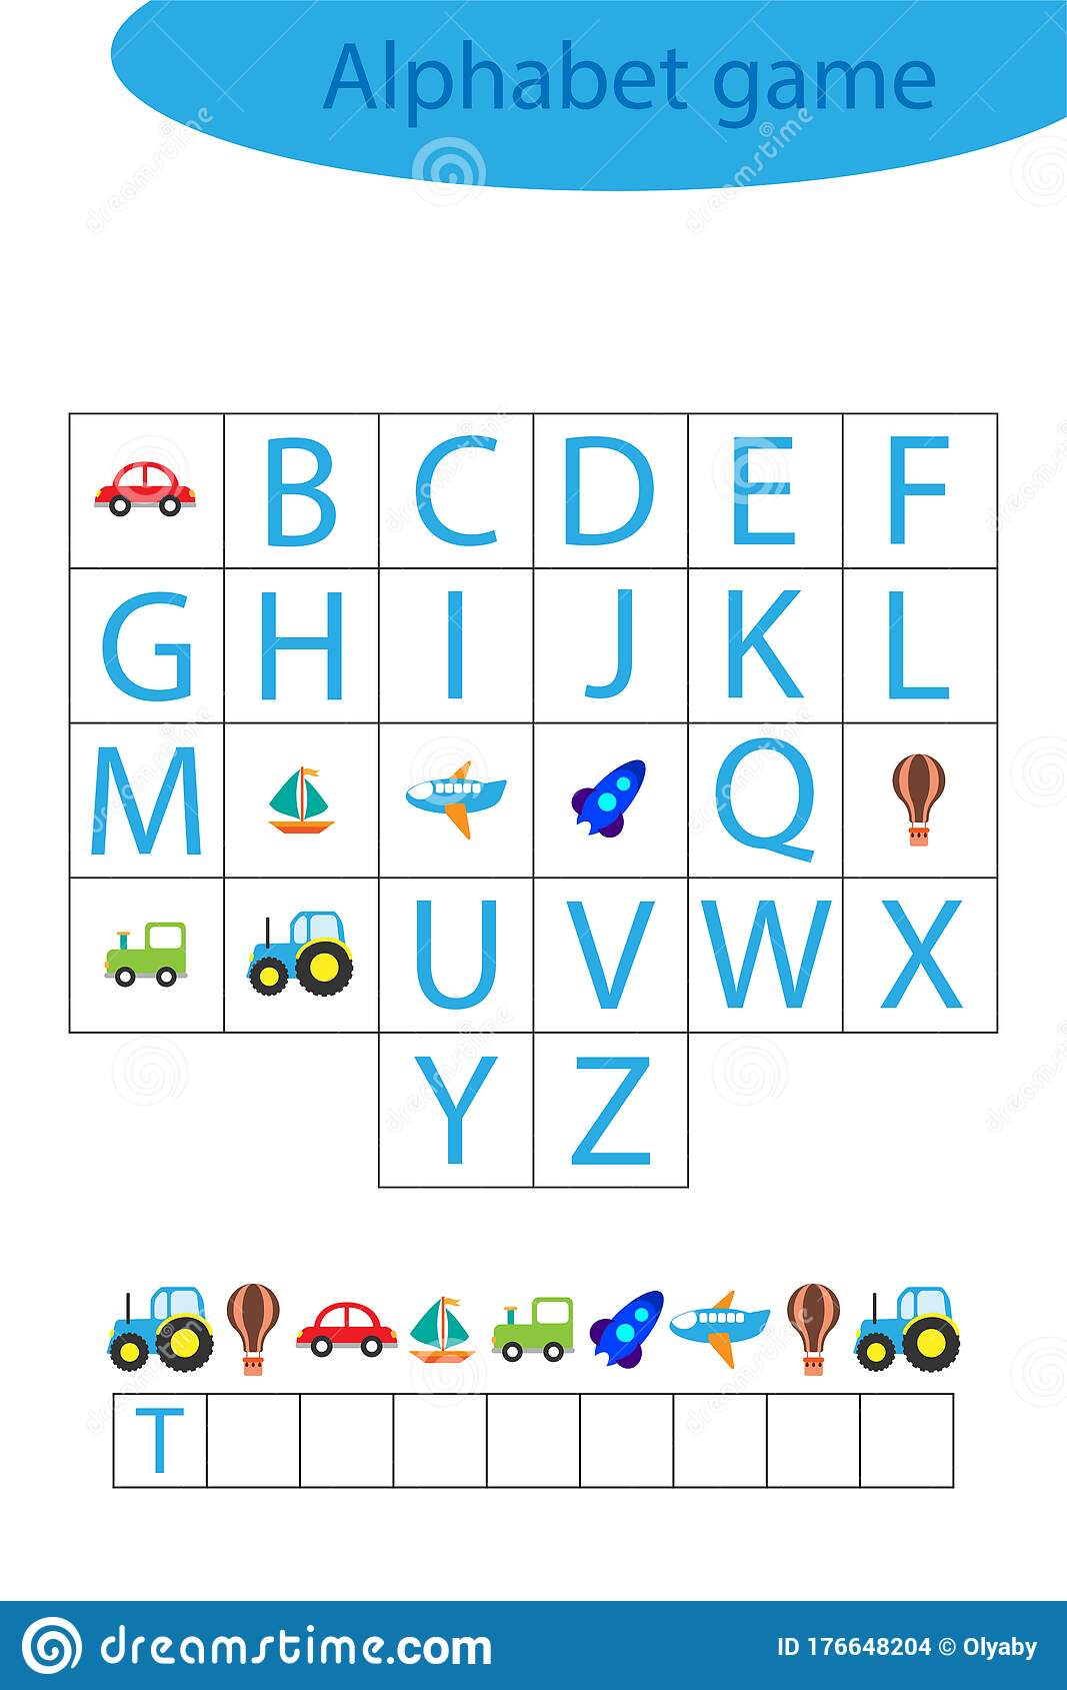 Transport Alphabet Game For Children Make A Word